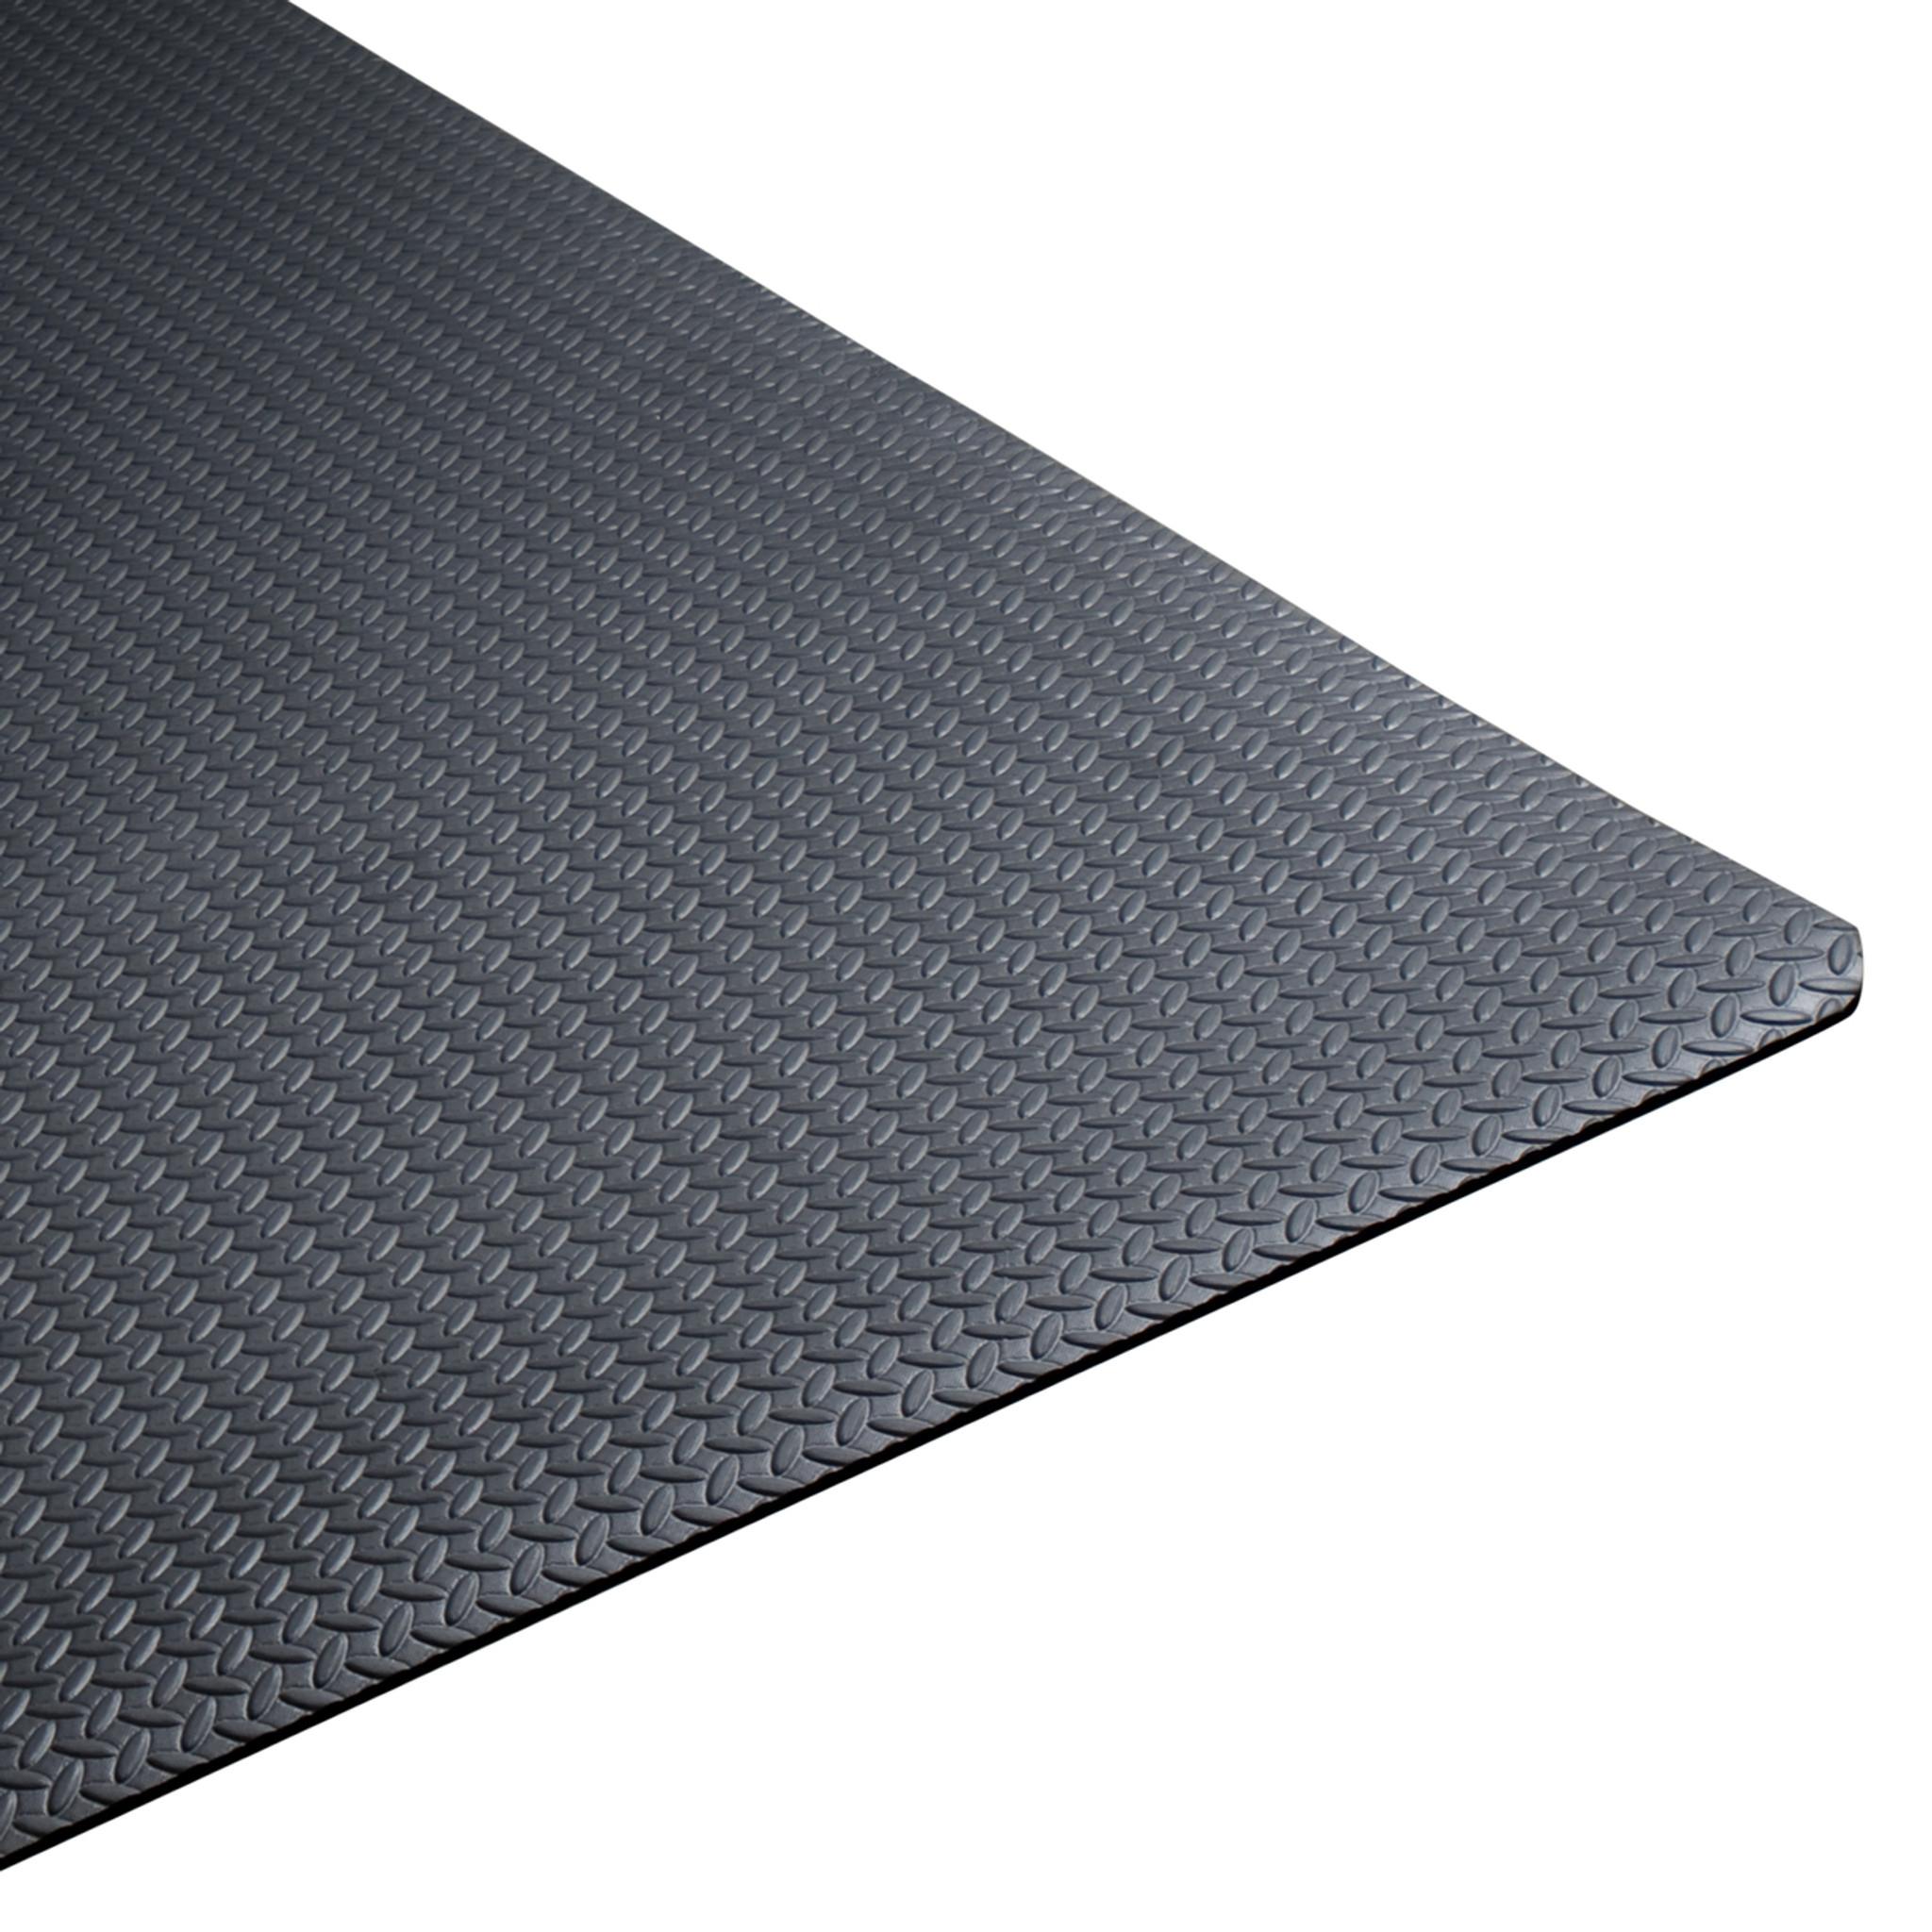 red dense eva singapore fitness show mats product mat sole tatami foam